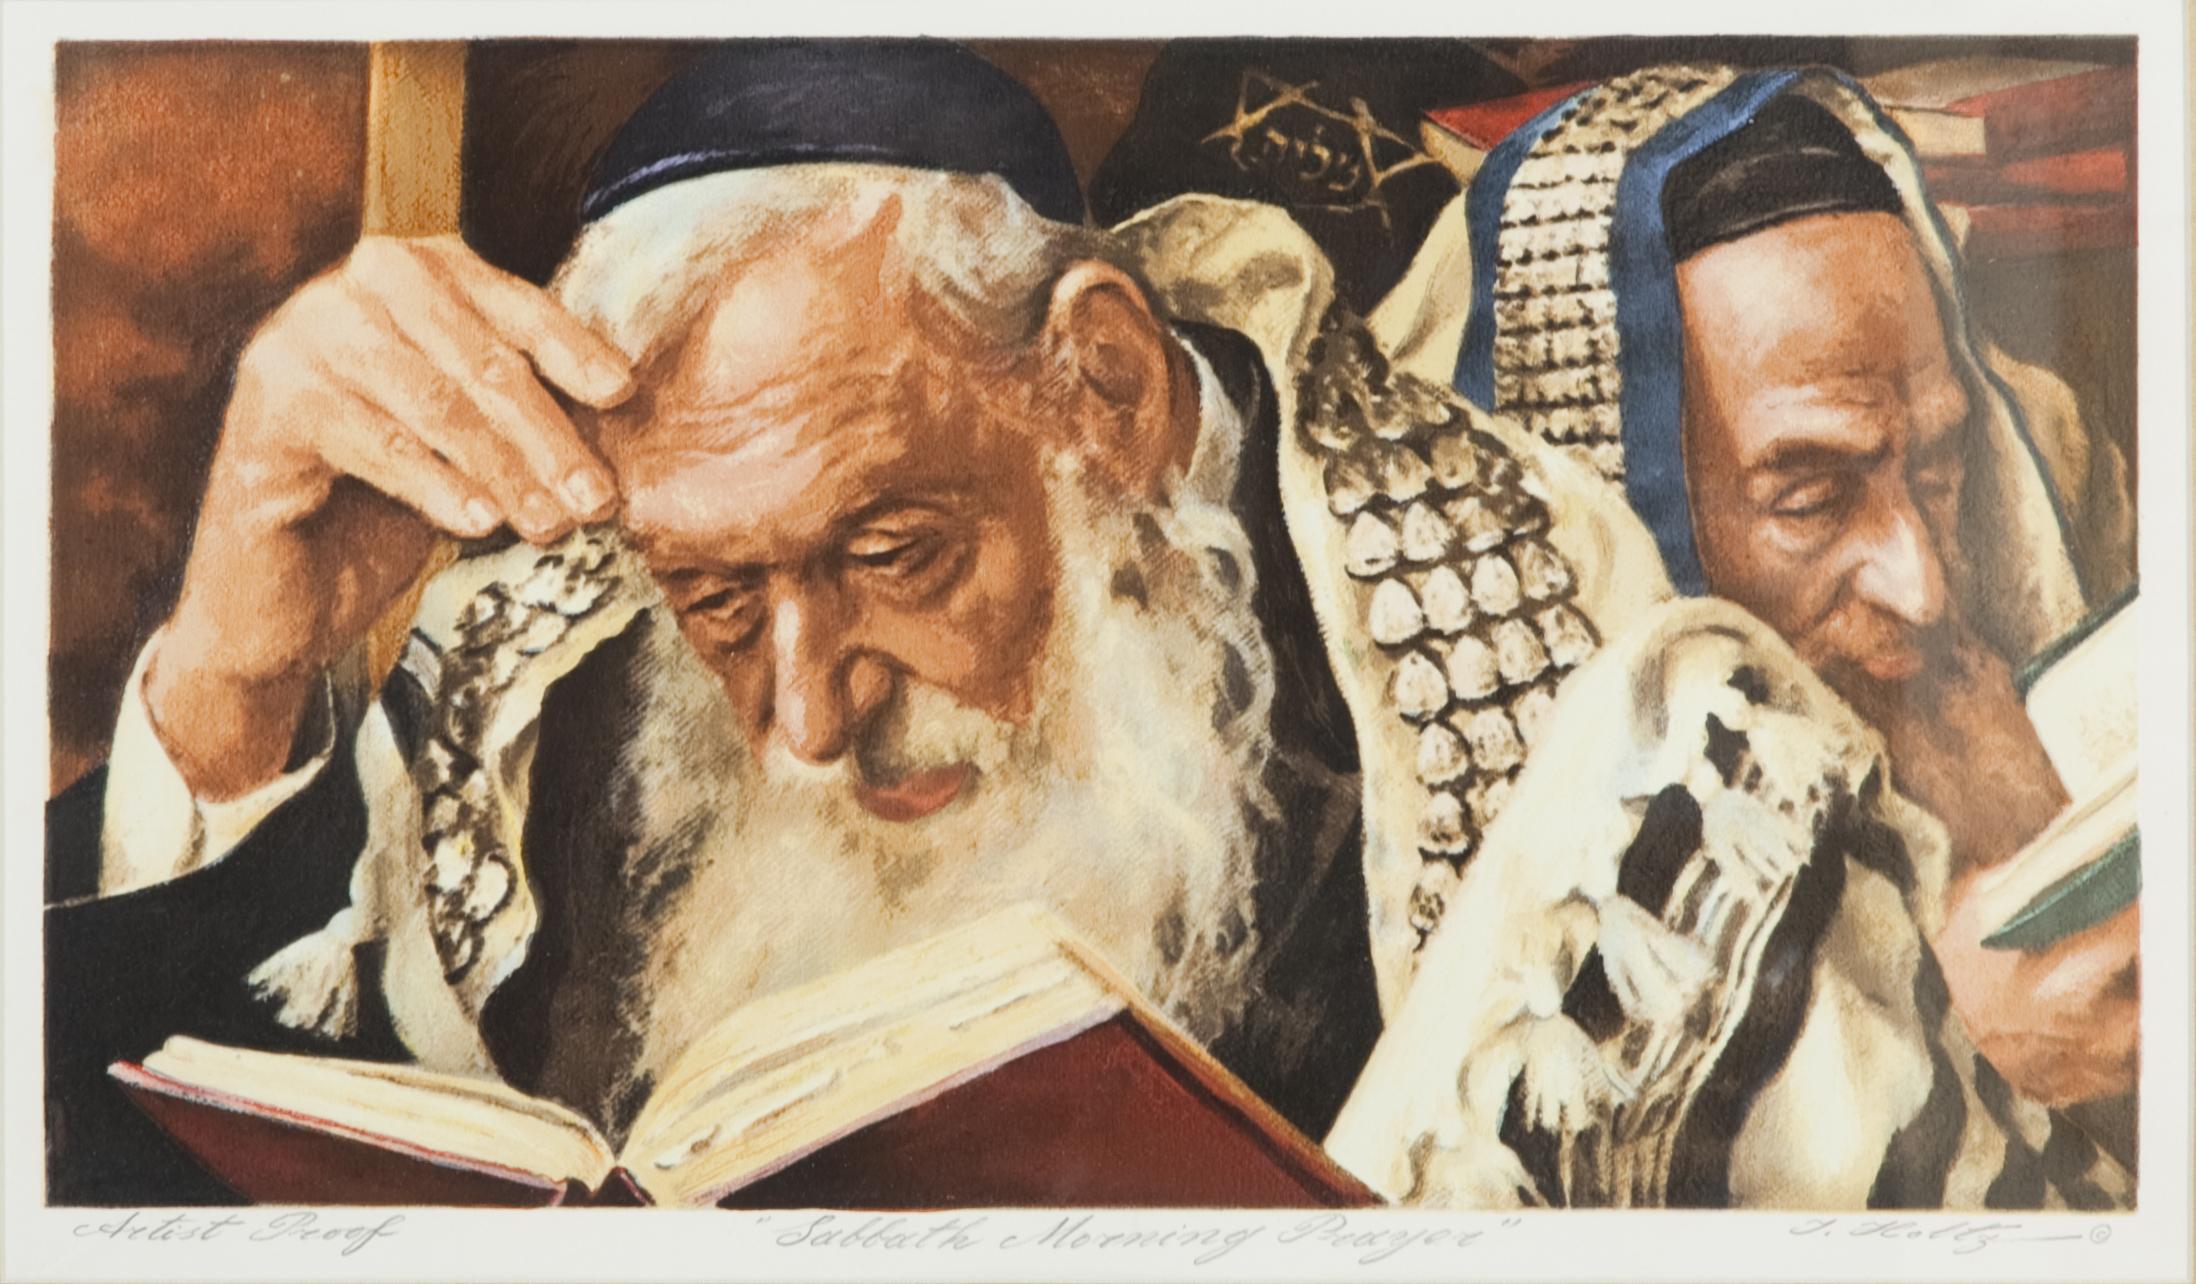 L06C Shabbat Morning Service - Color - Serigraph - 23.5 x 15.5 - No Frame - $530